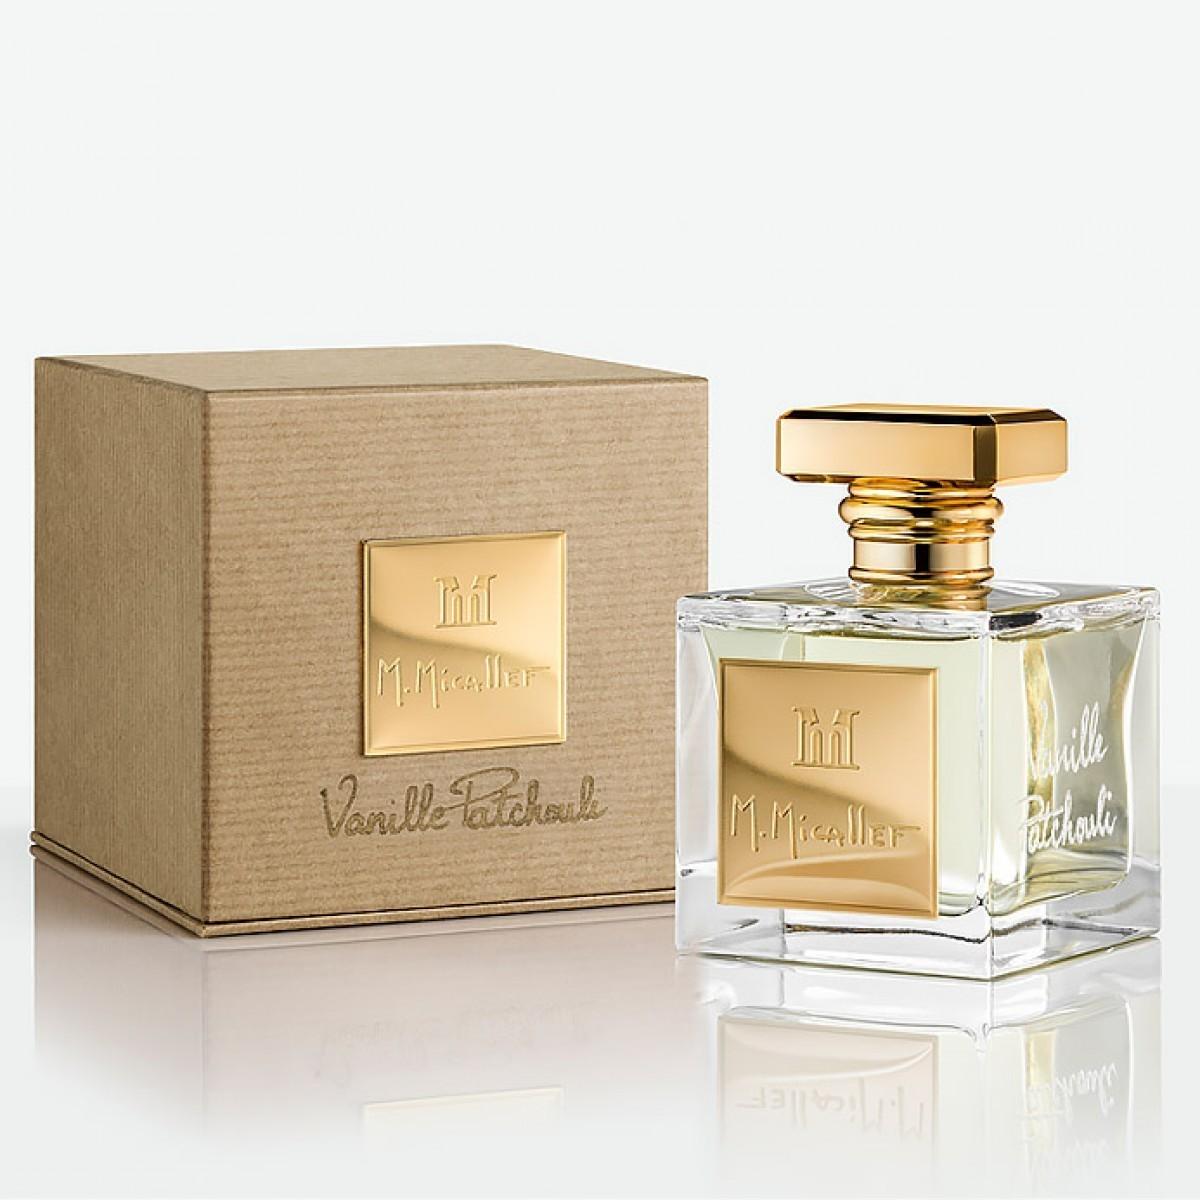 M. Micallef Vanille Patchouli аромат для мужчин и женщин